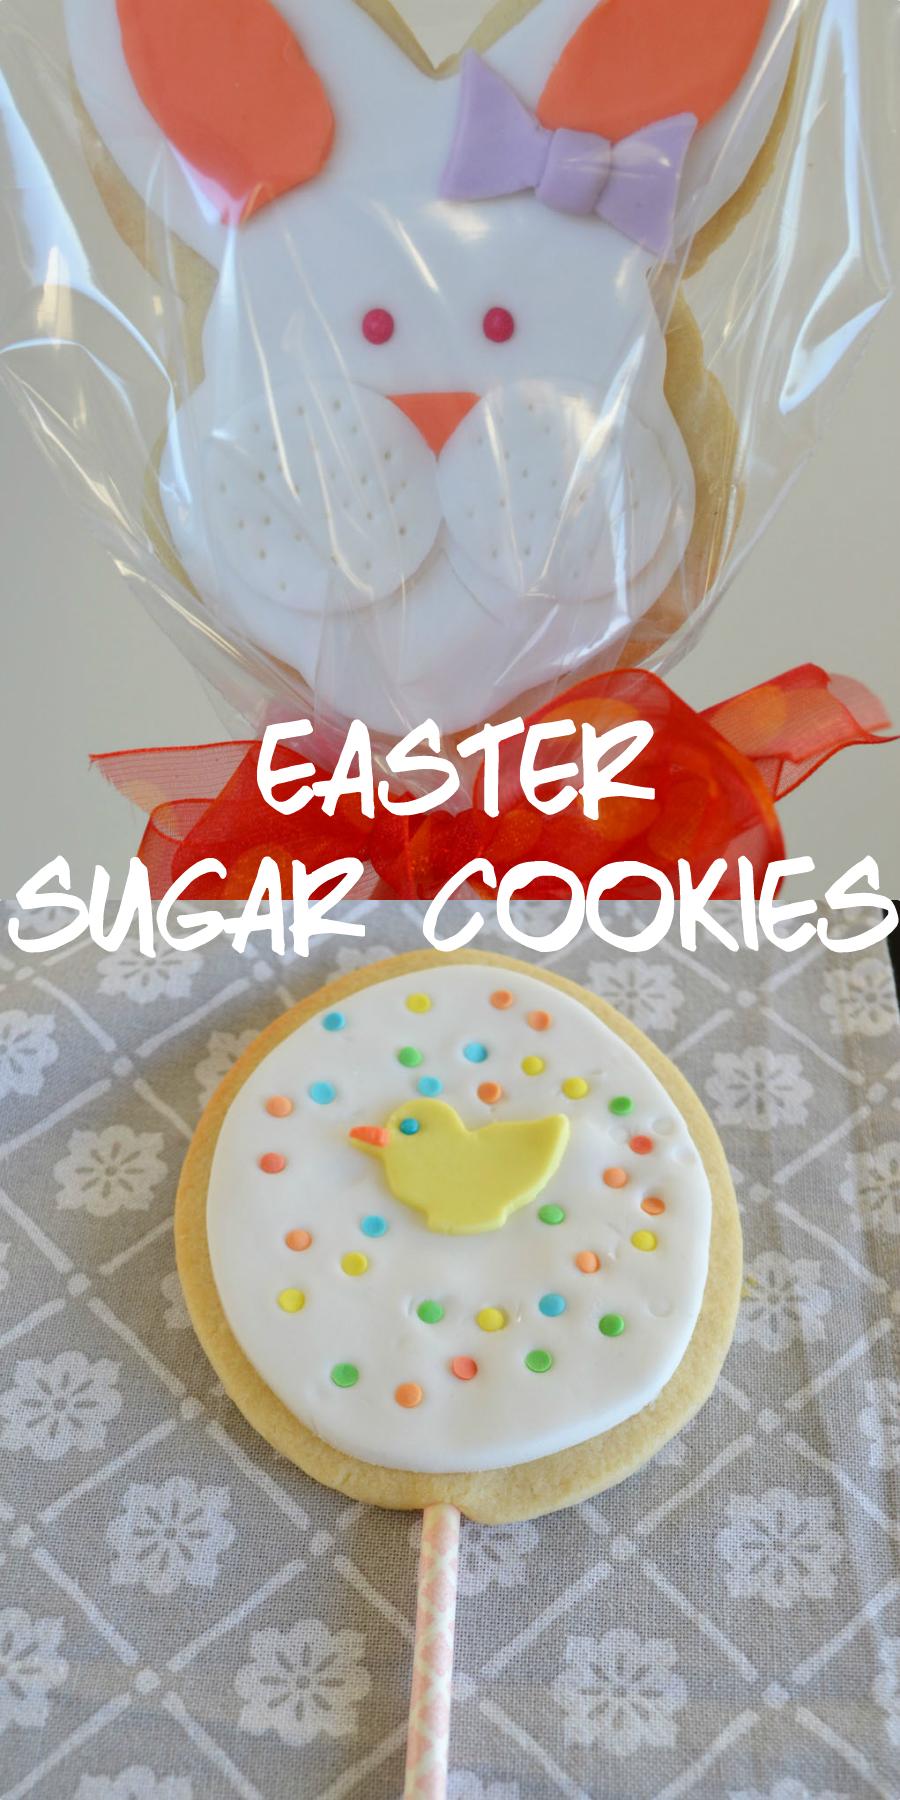 The cutest easter sugar cookies